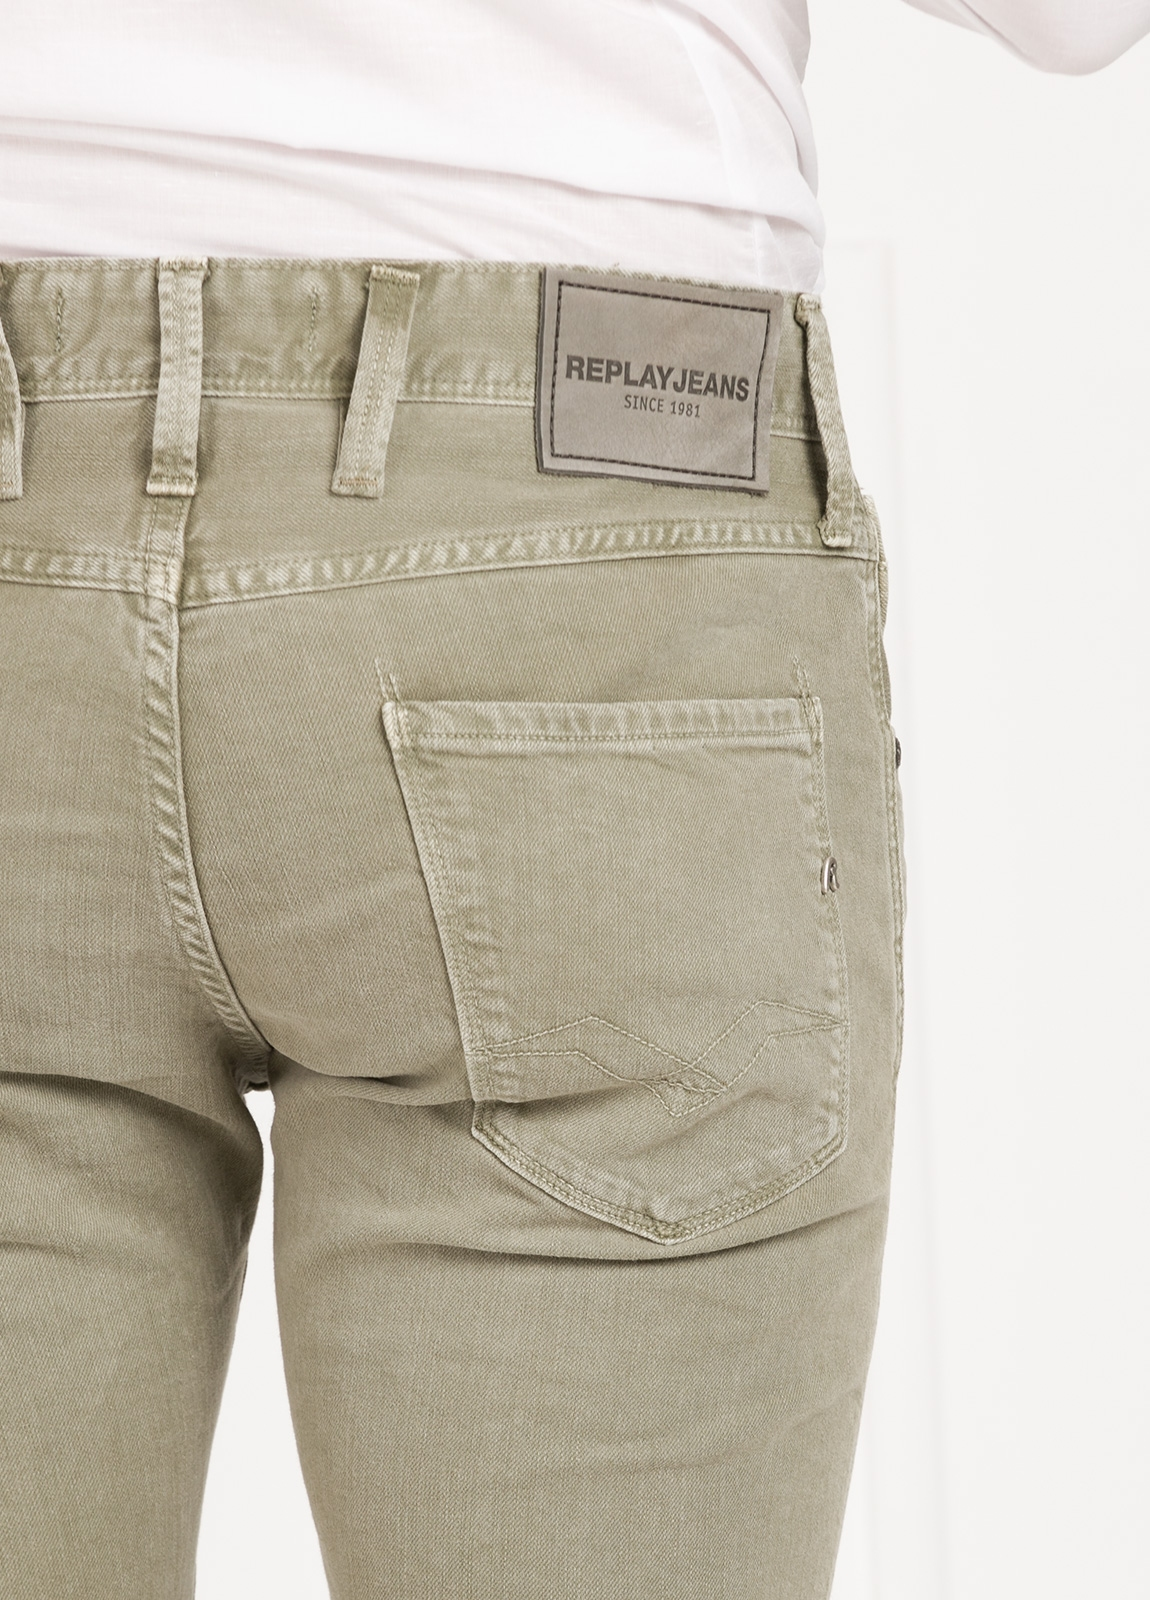 Pantalón tejano SLIM FIT M914D ANBASS color kaki lavado algodón - Ítem2